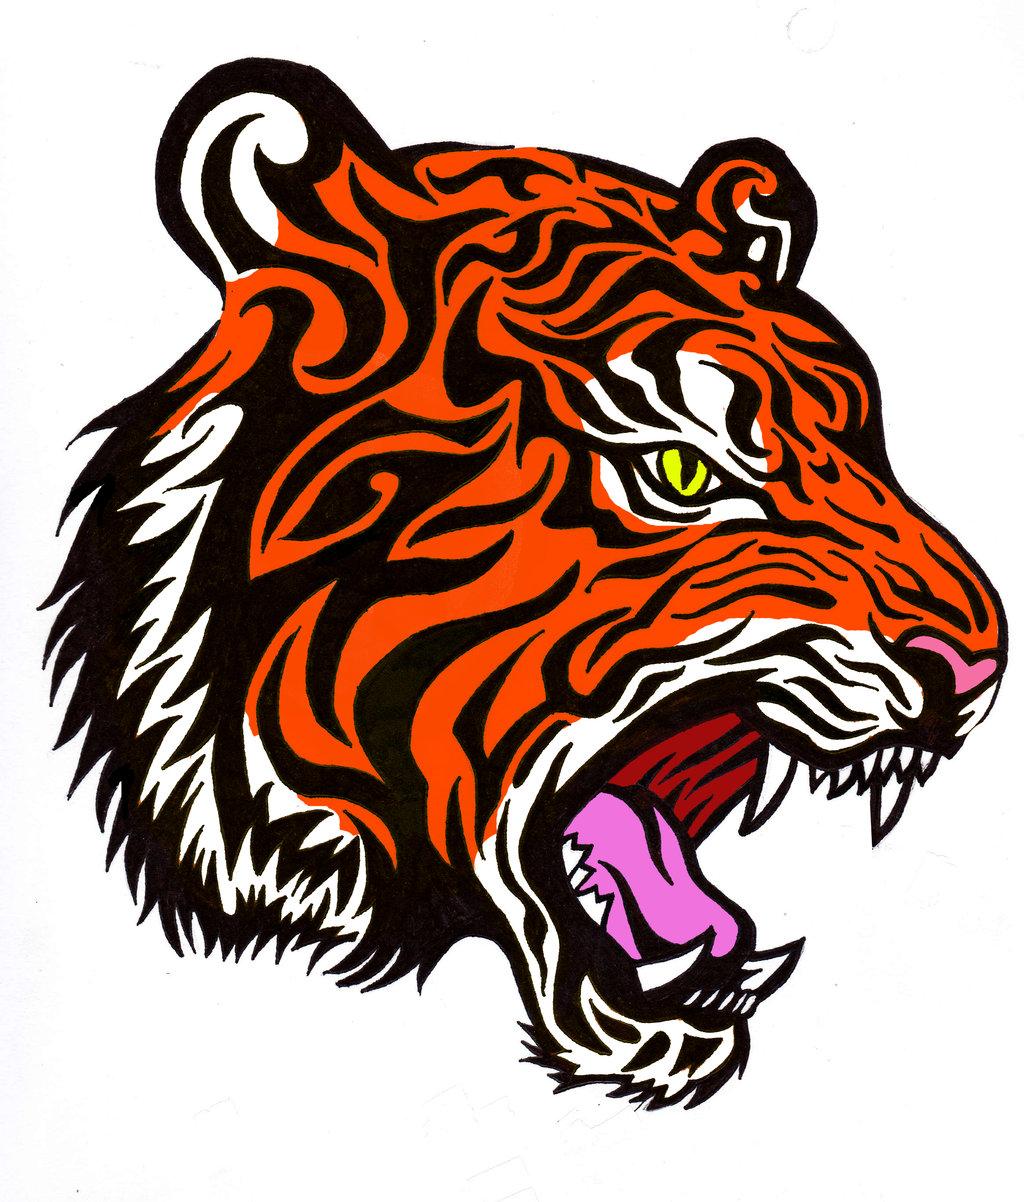 Colorful tribal tiger head tattoo design by Bathedinsin